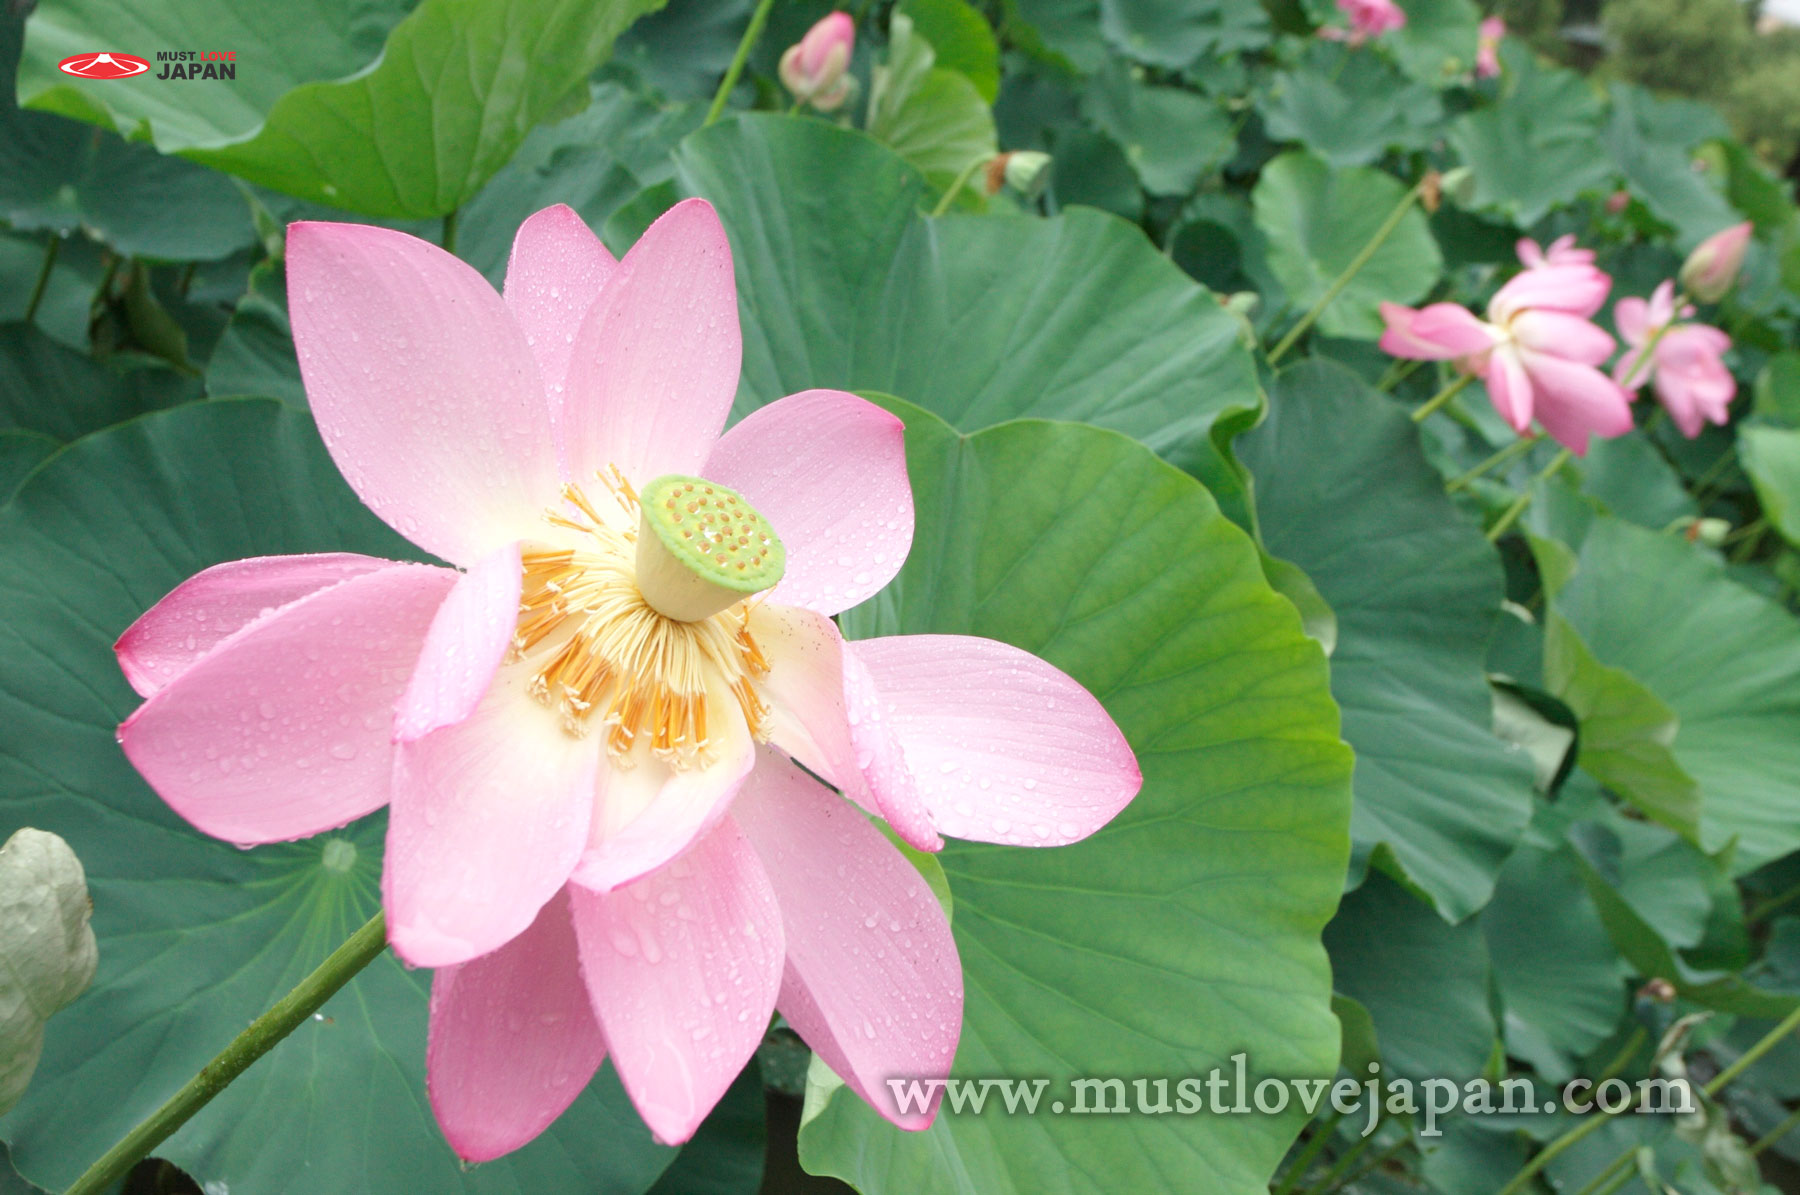 Lotus In Kanto Mustlovejapan Video Travel Guide